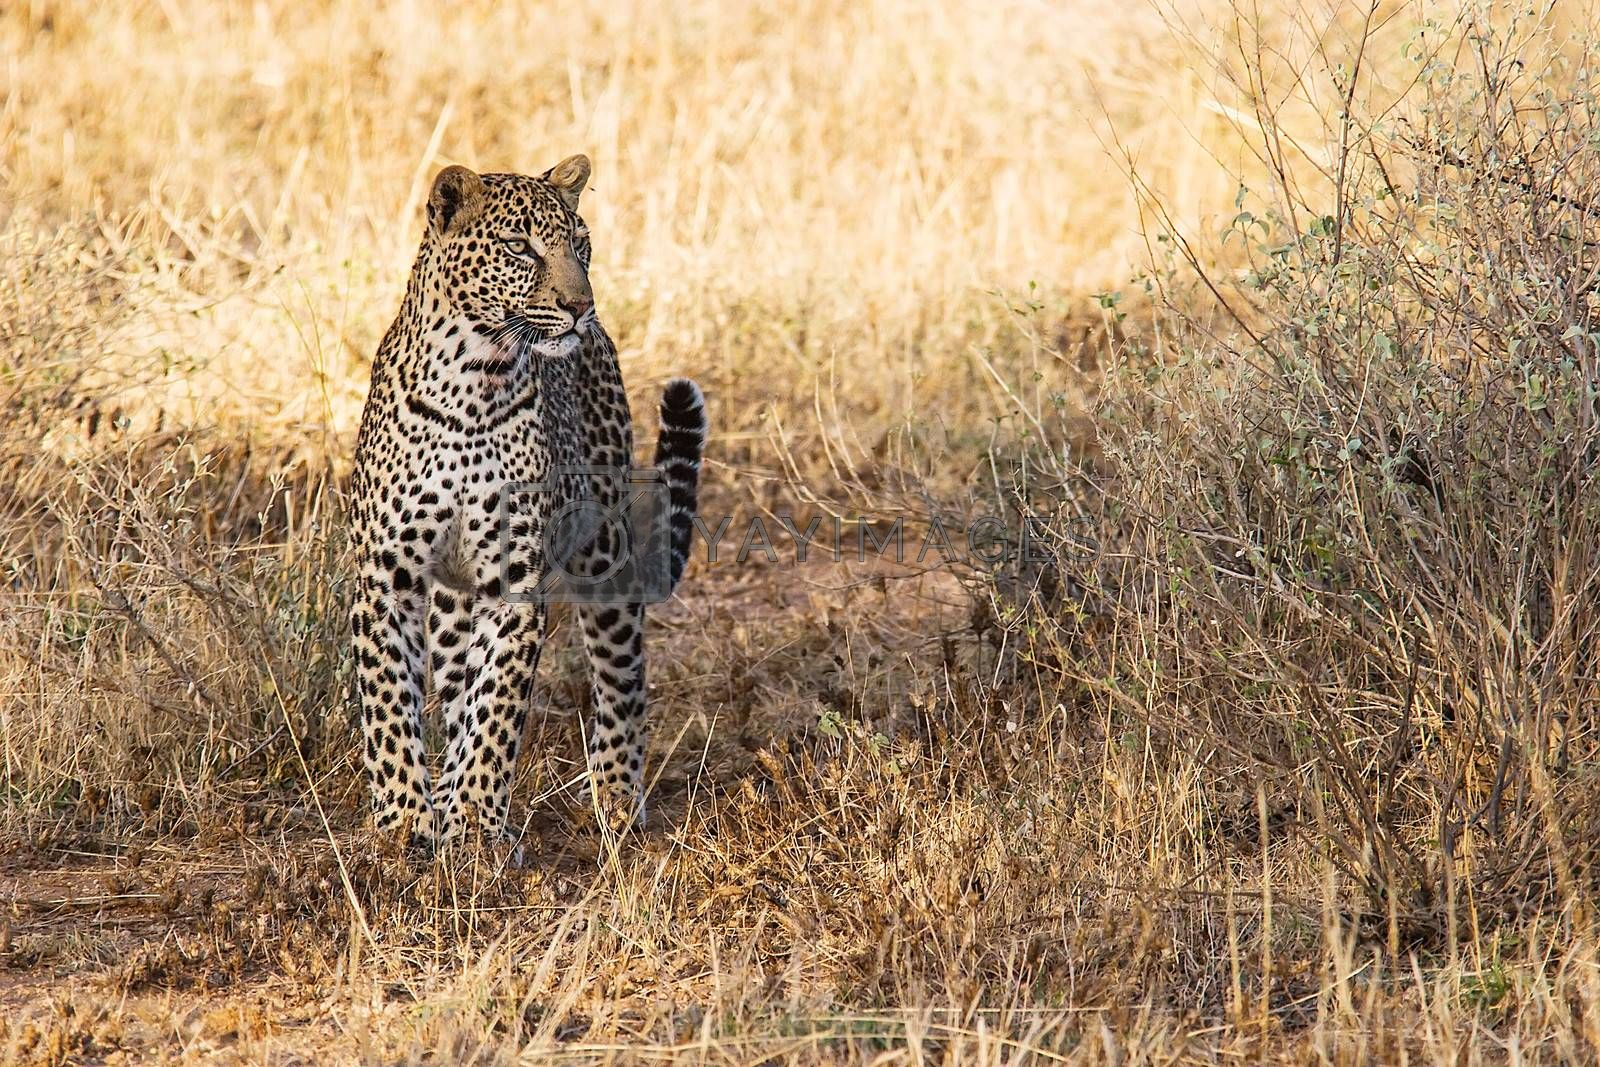 Beautiful leopard in the african savannah. Scientific name:  Panthera pardus